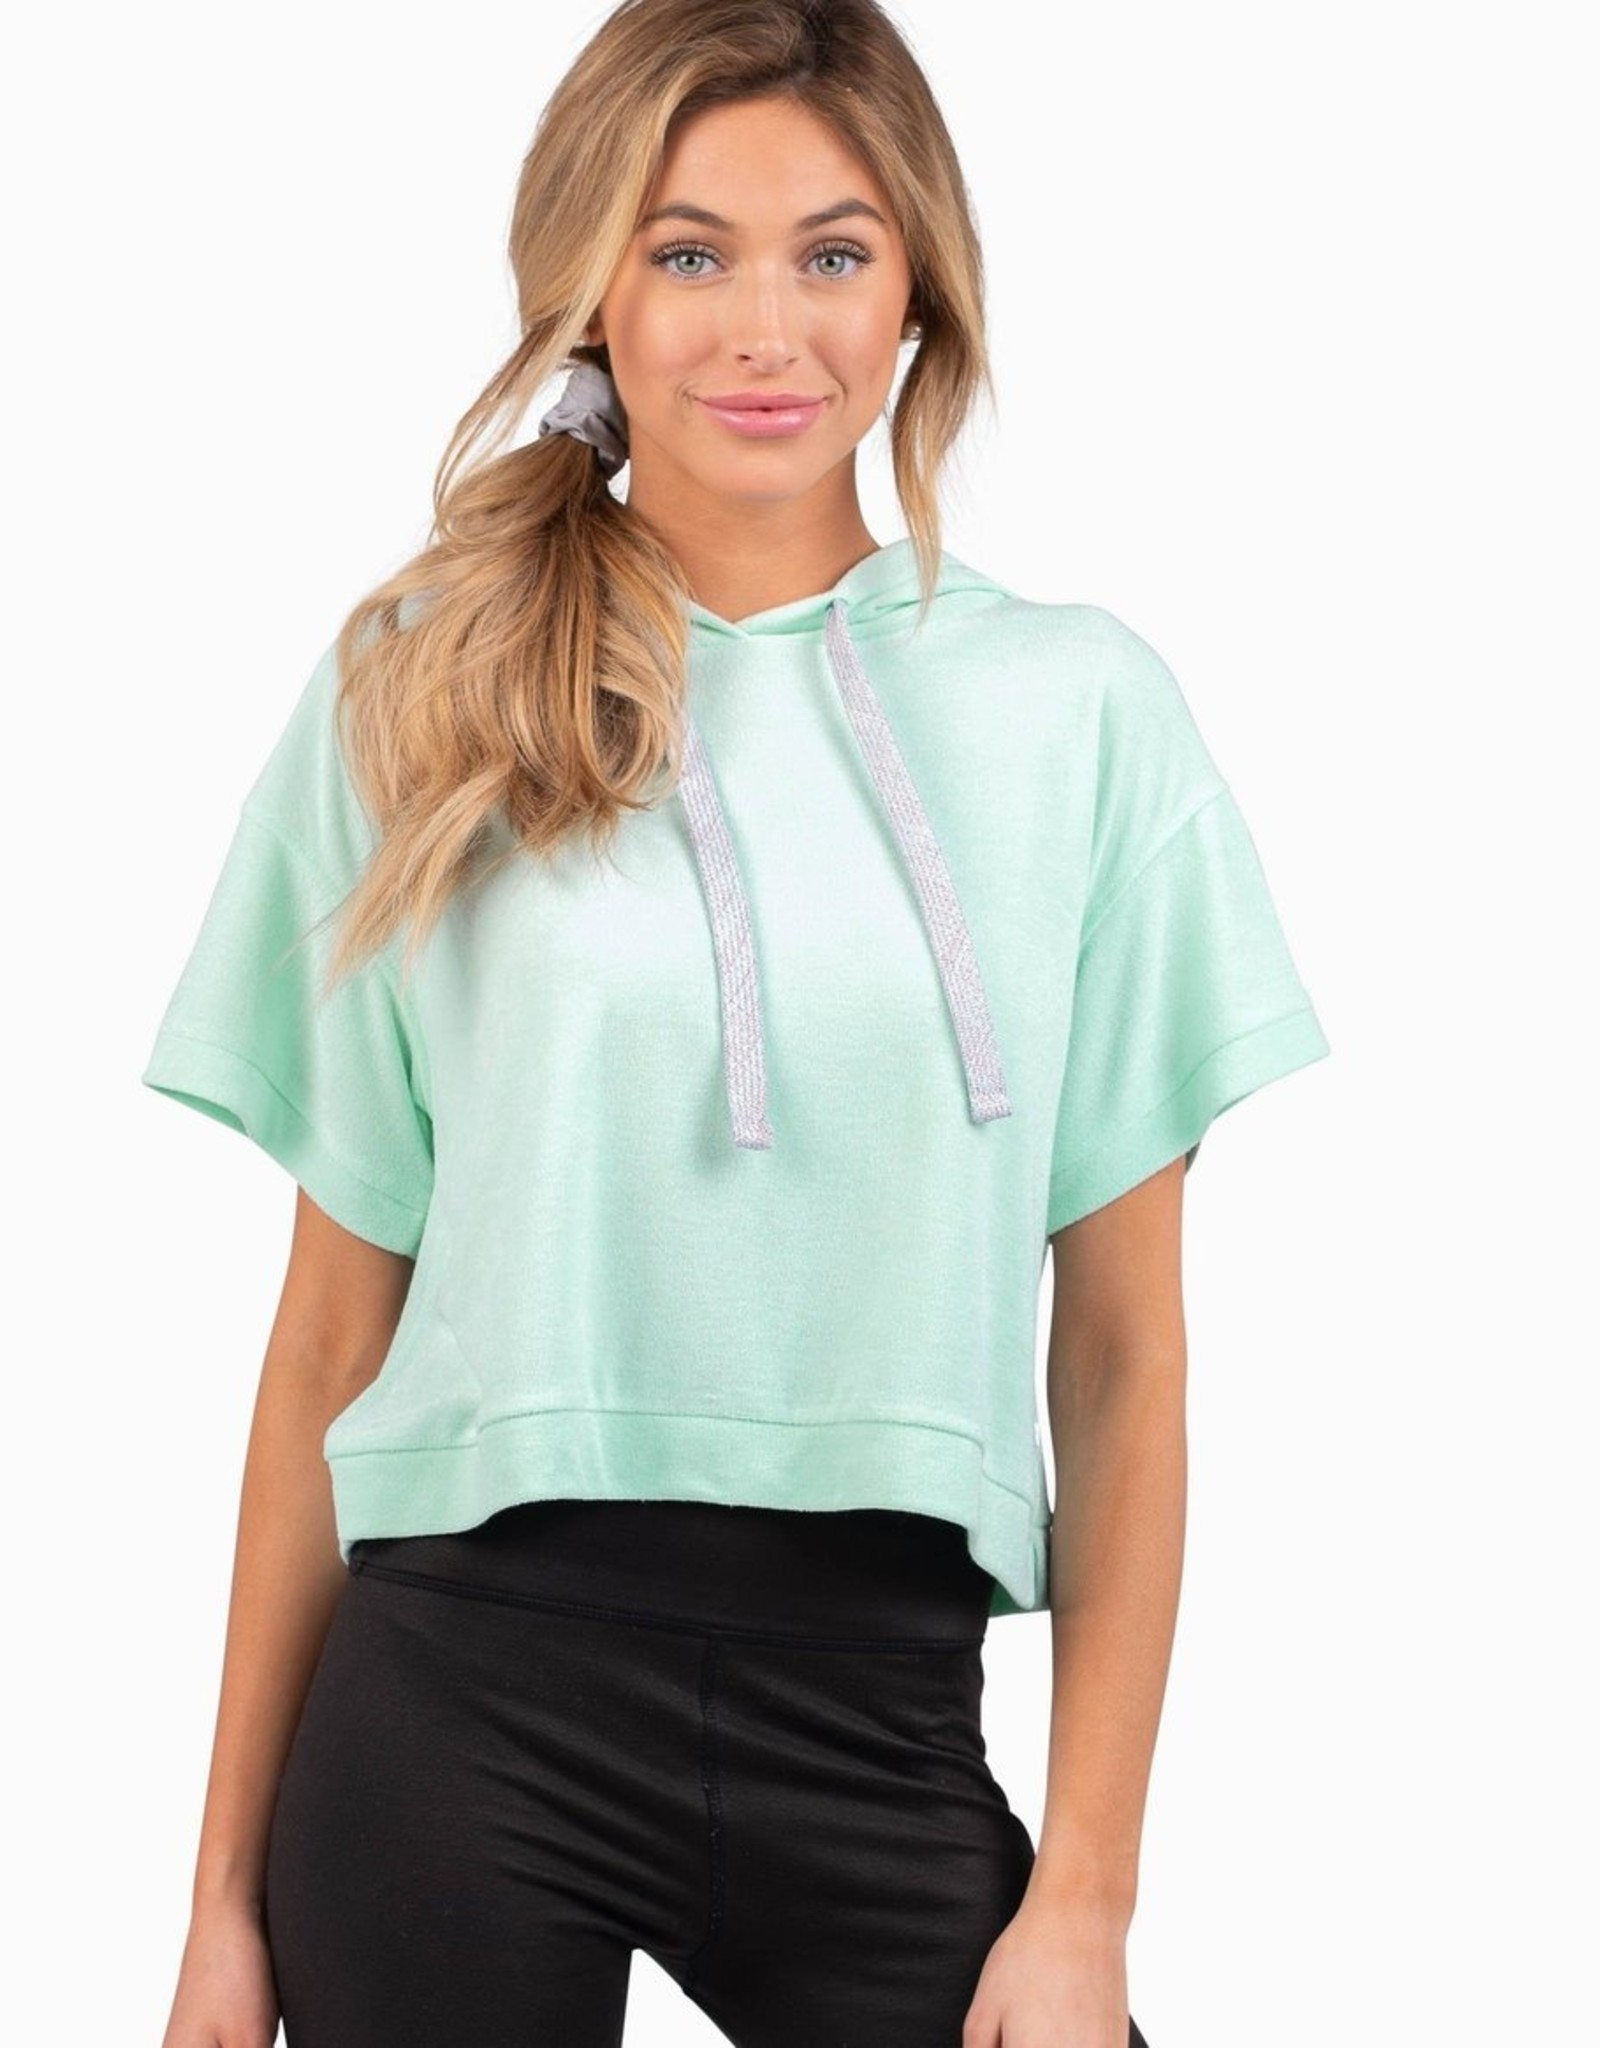 Southern Shirt Sporty Spice Sweatshirt